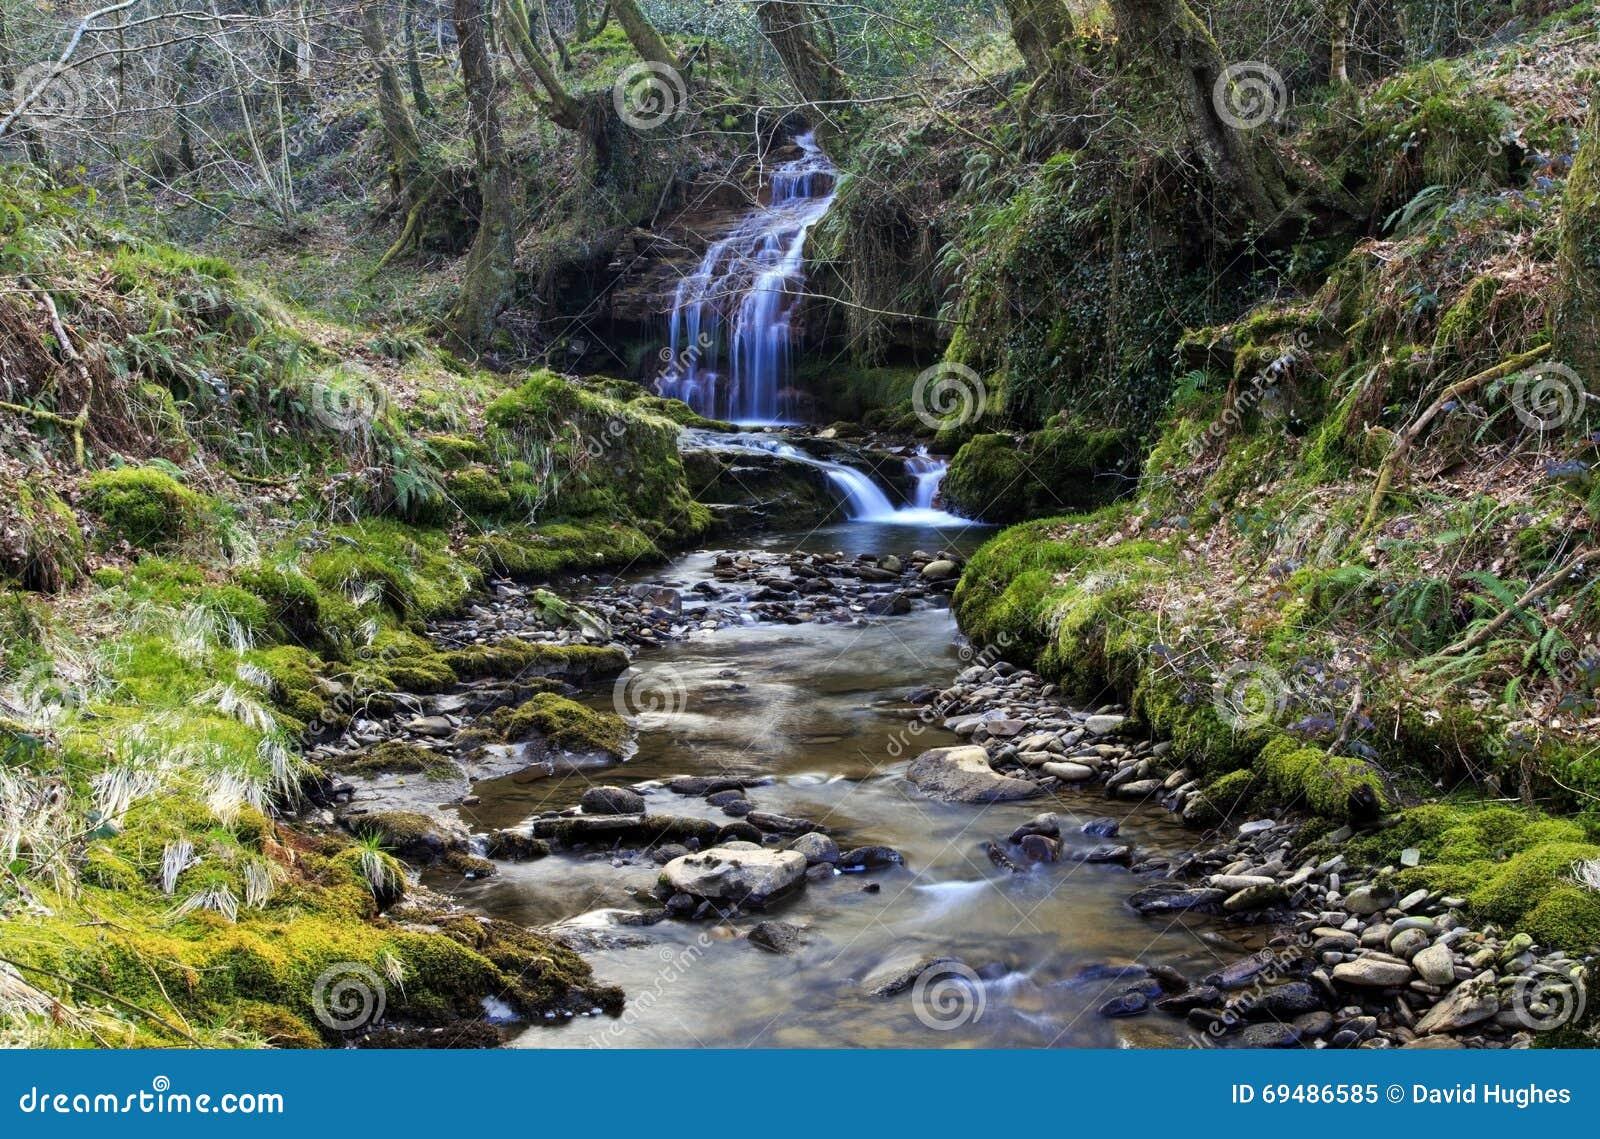 Petite cascade, Creunant juste au-dessous de Pwll y Alun